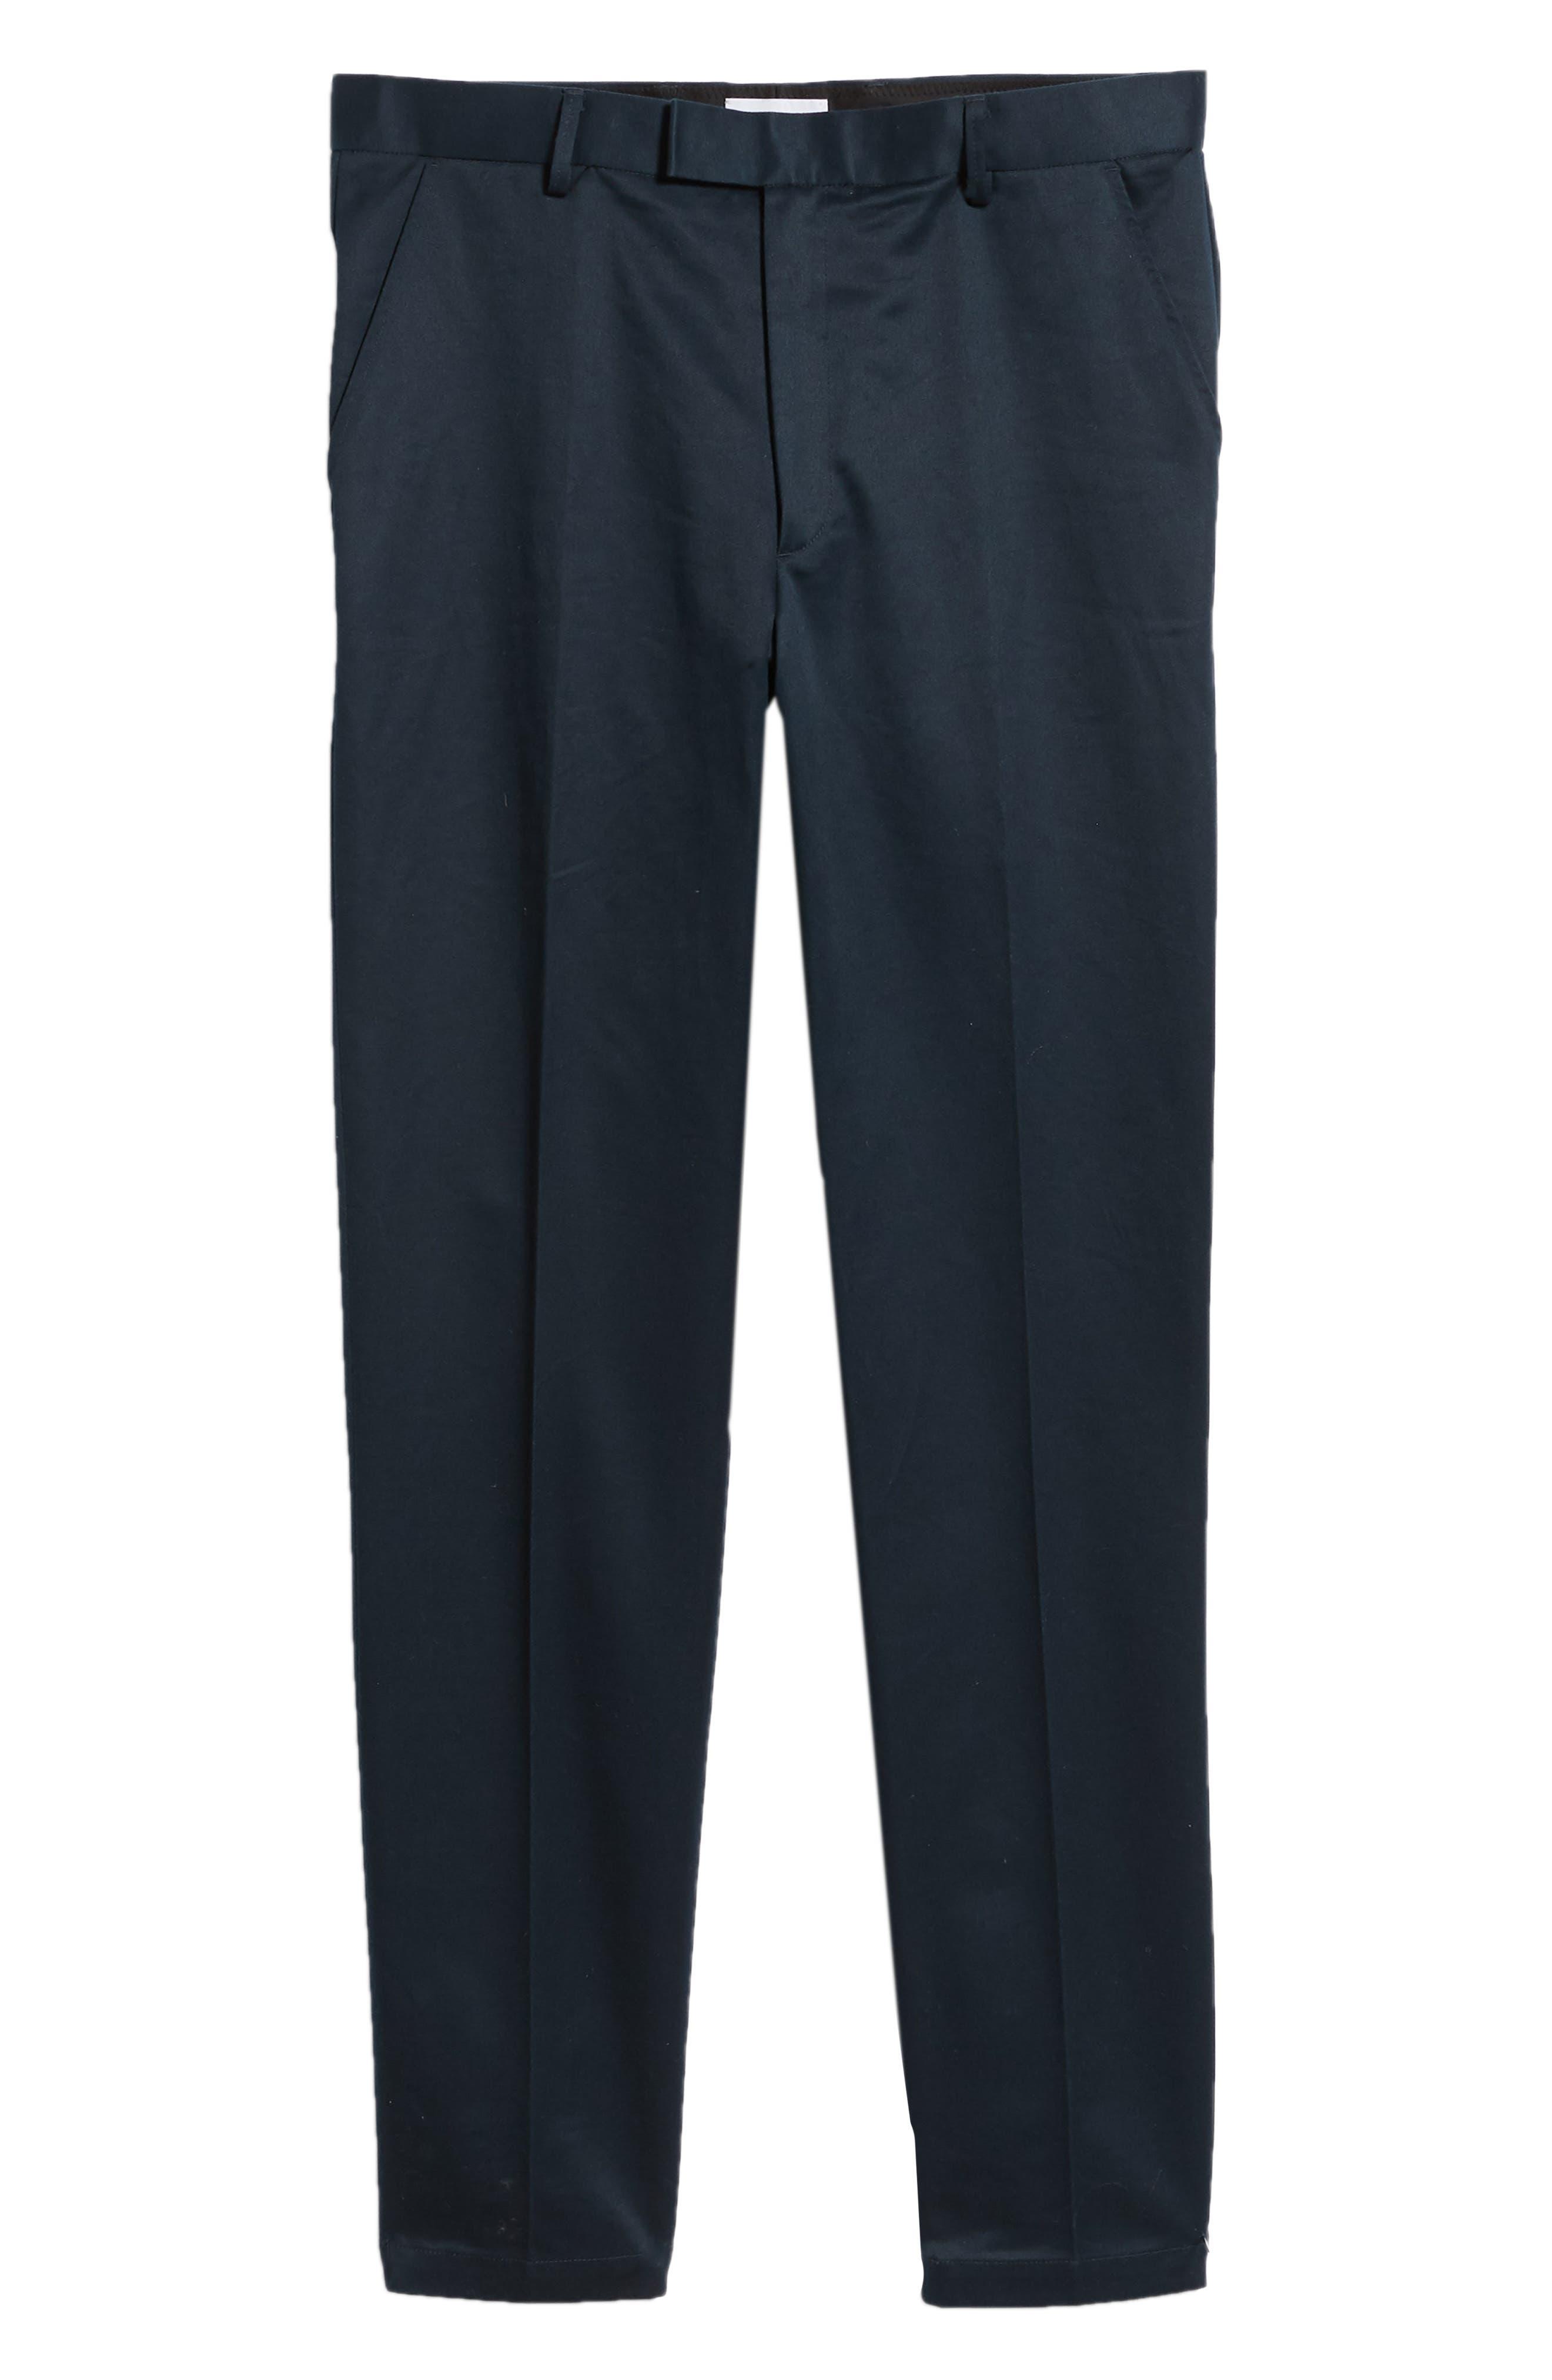 Leon Regular Fit Pants,                             Alternate thumbnail 6, color,                             MIDNIGHT